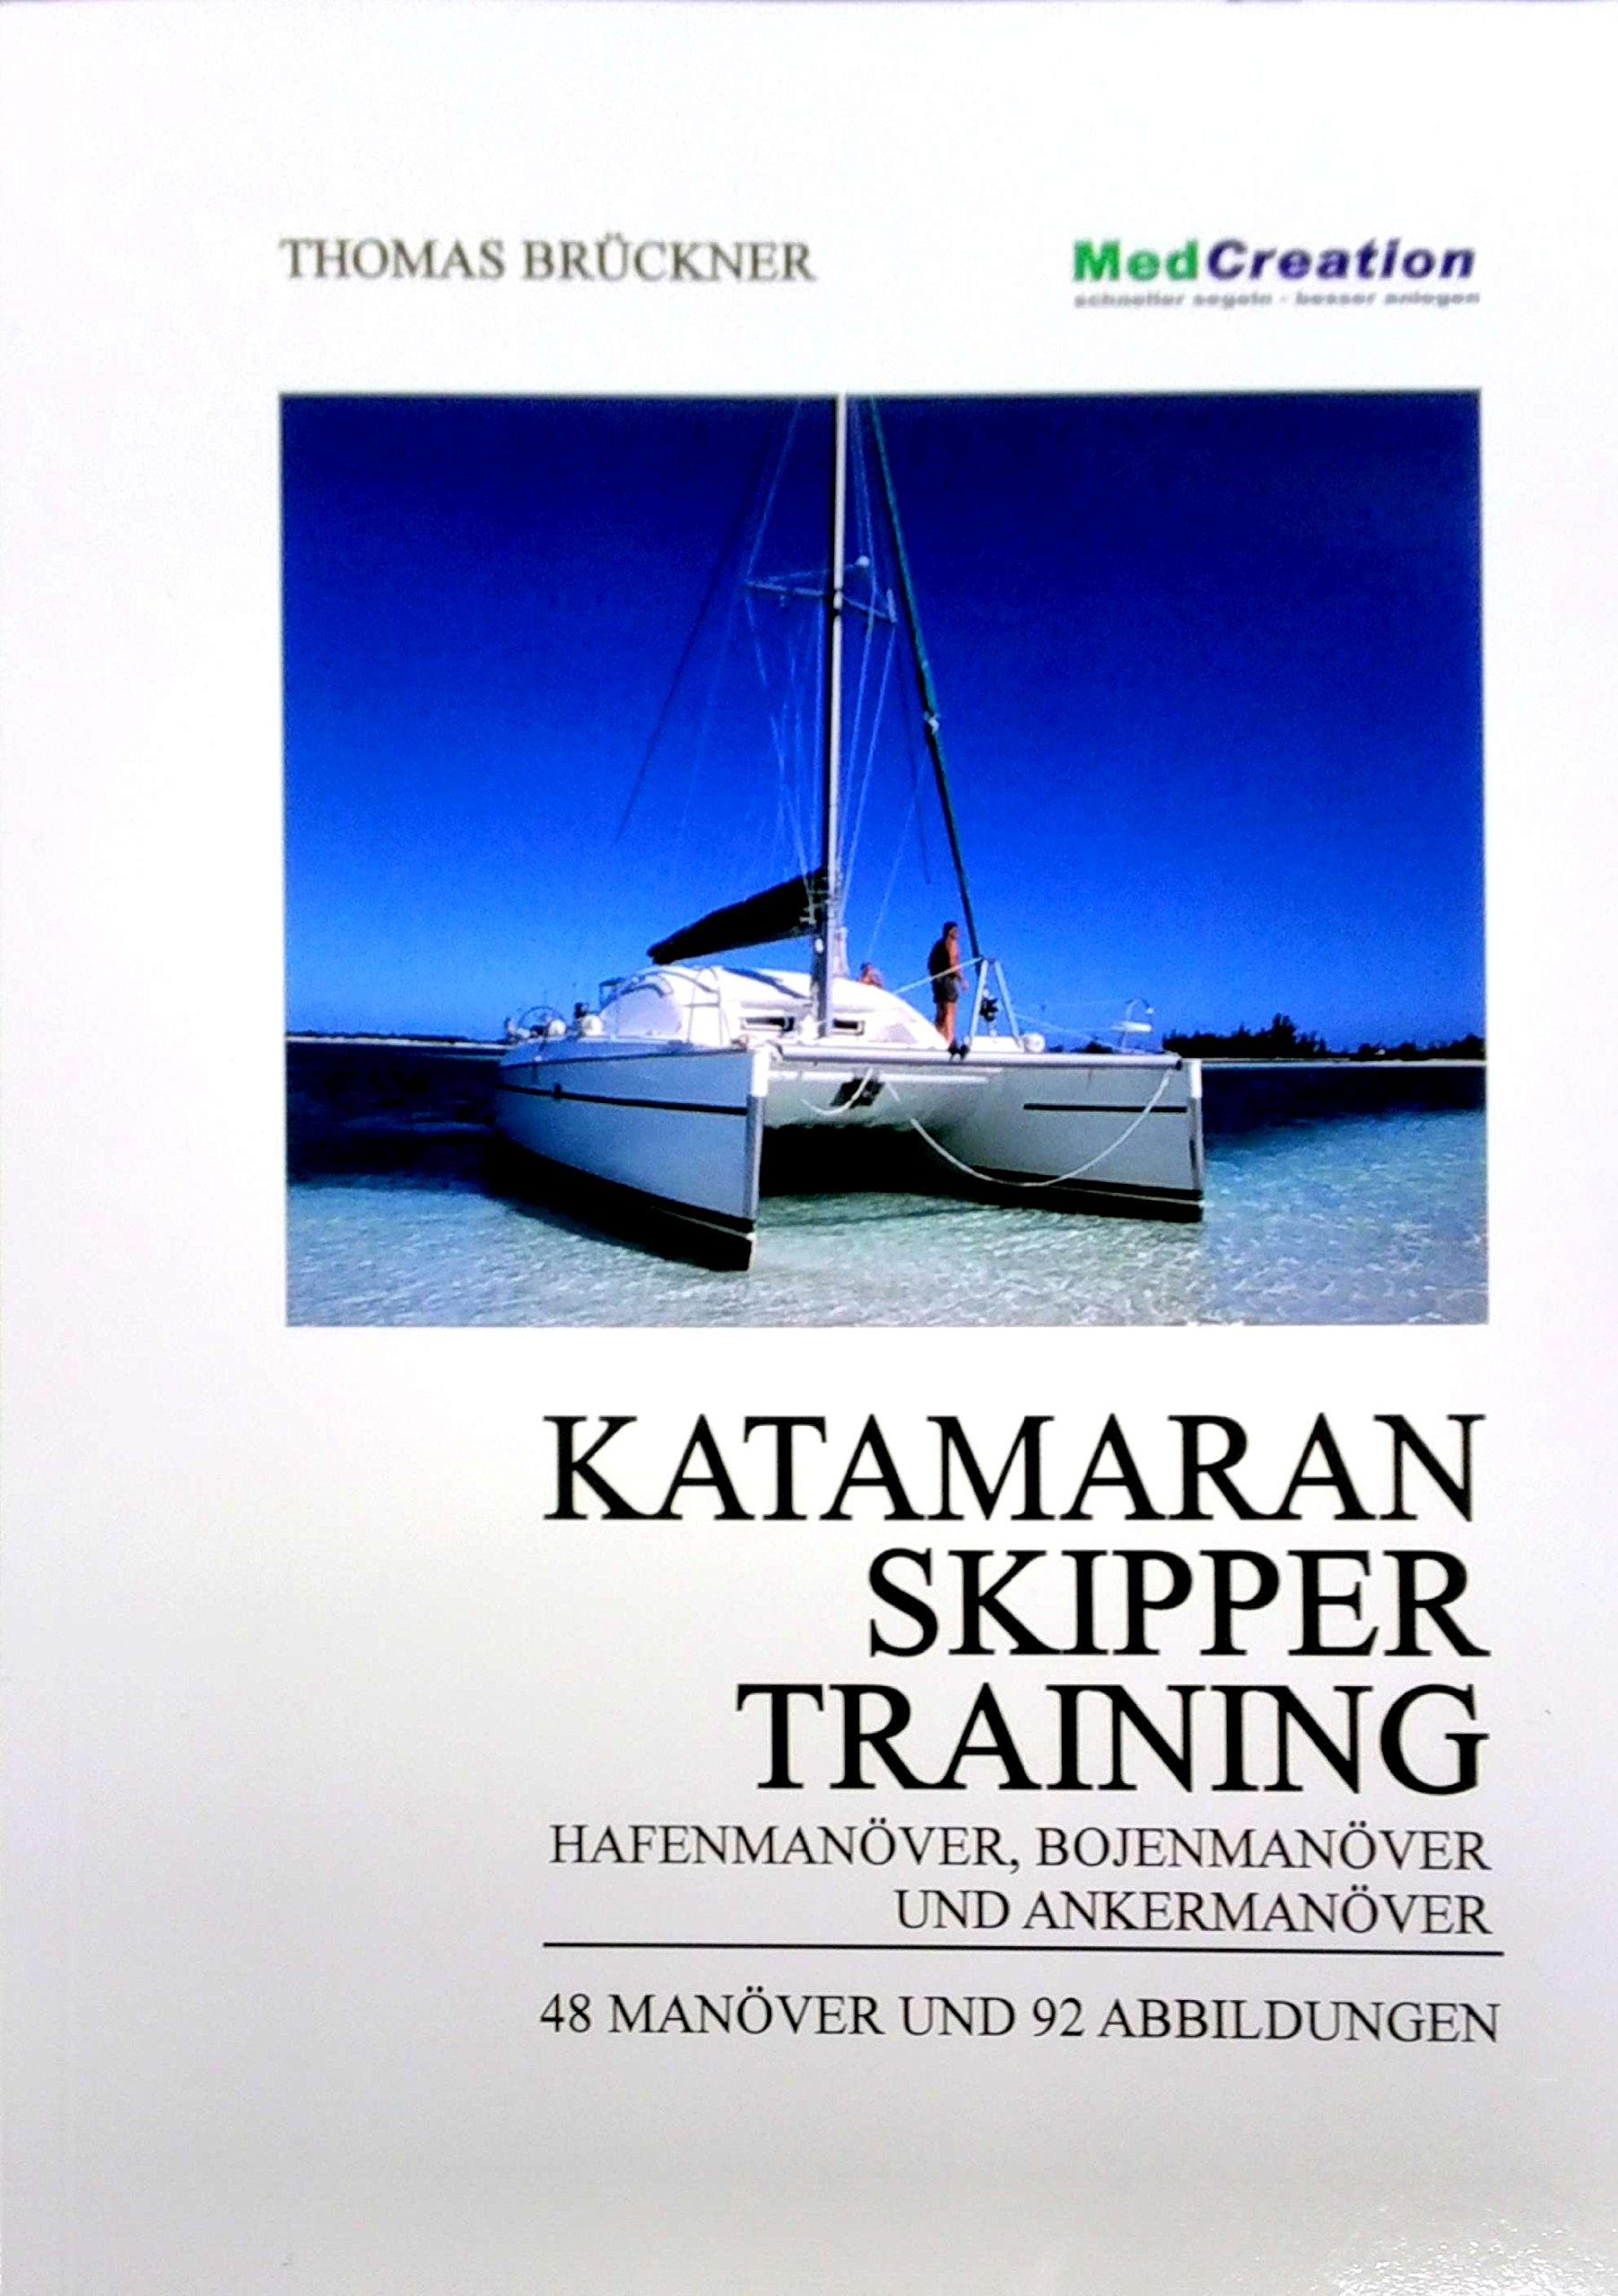 Kat-Skippertraining: Hafenmanöver, Bojenmanöver und Ankermanöver